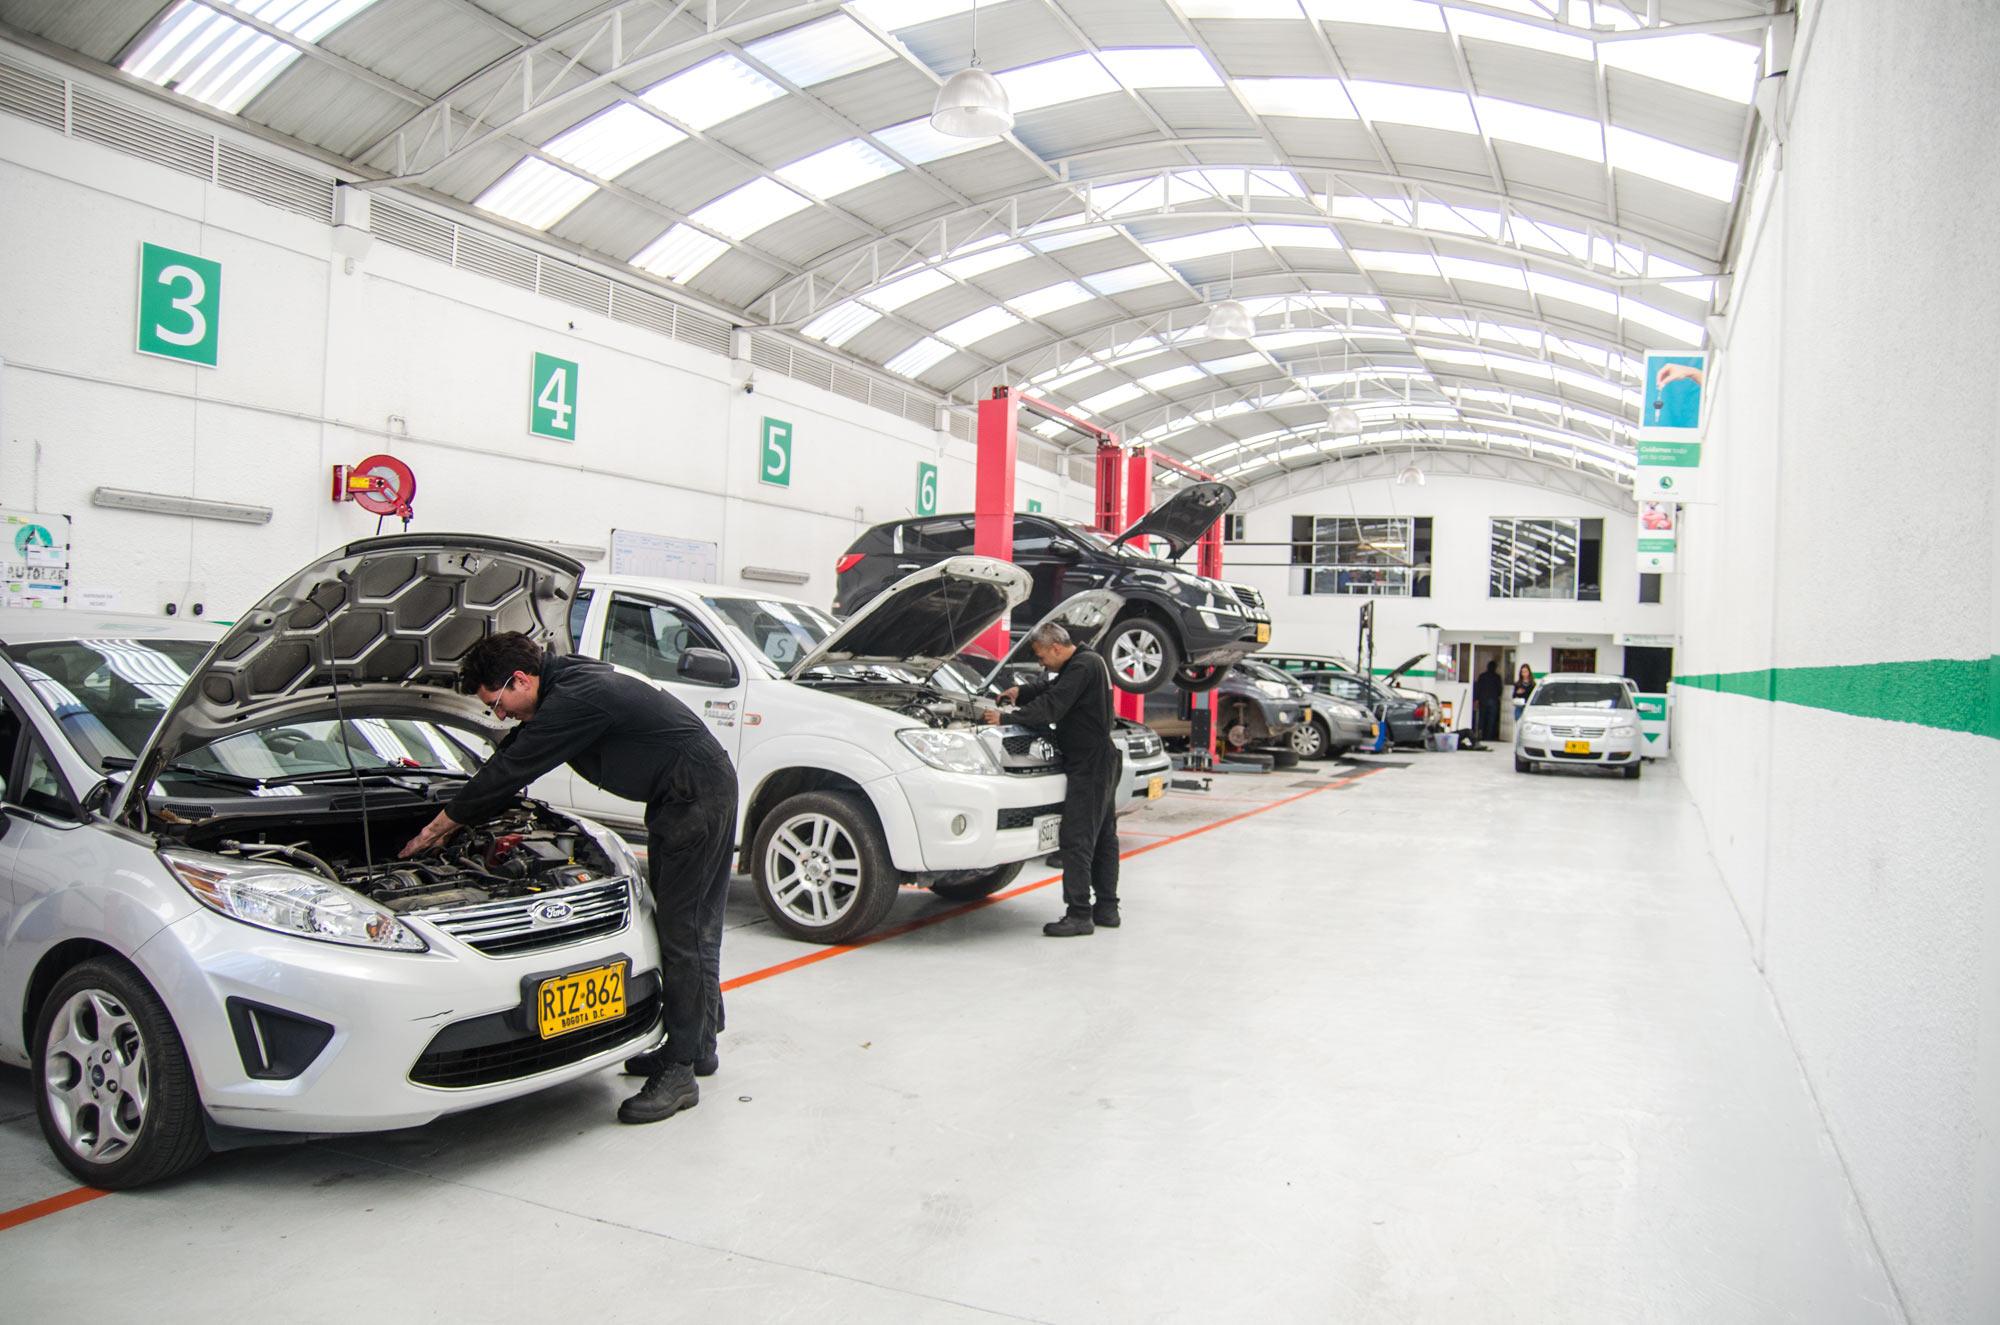 Autolab taller de mecánica automotriz